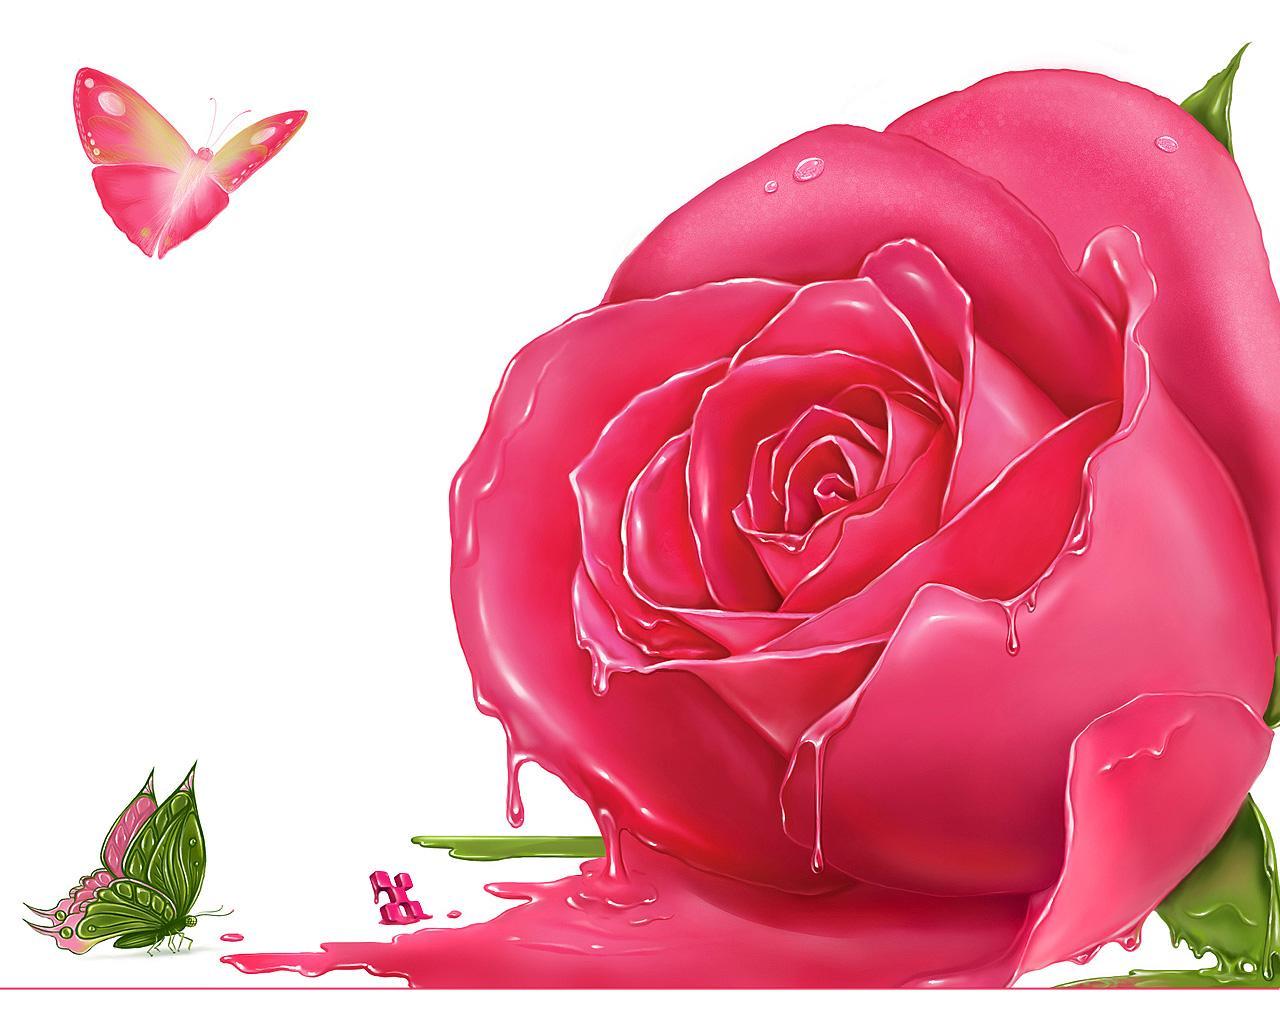 rose meaning pink roses pink rose wallpaper light pink roses 1280x1024